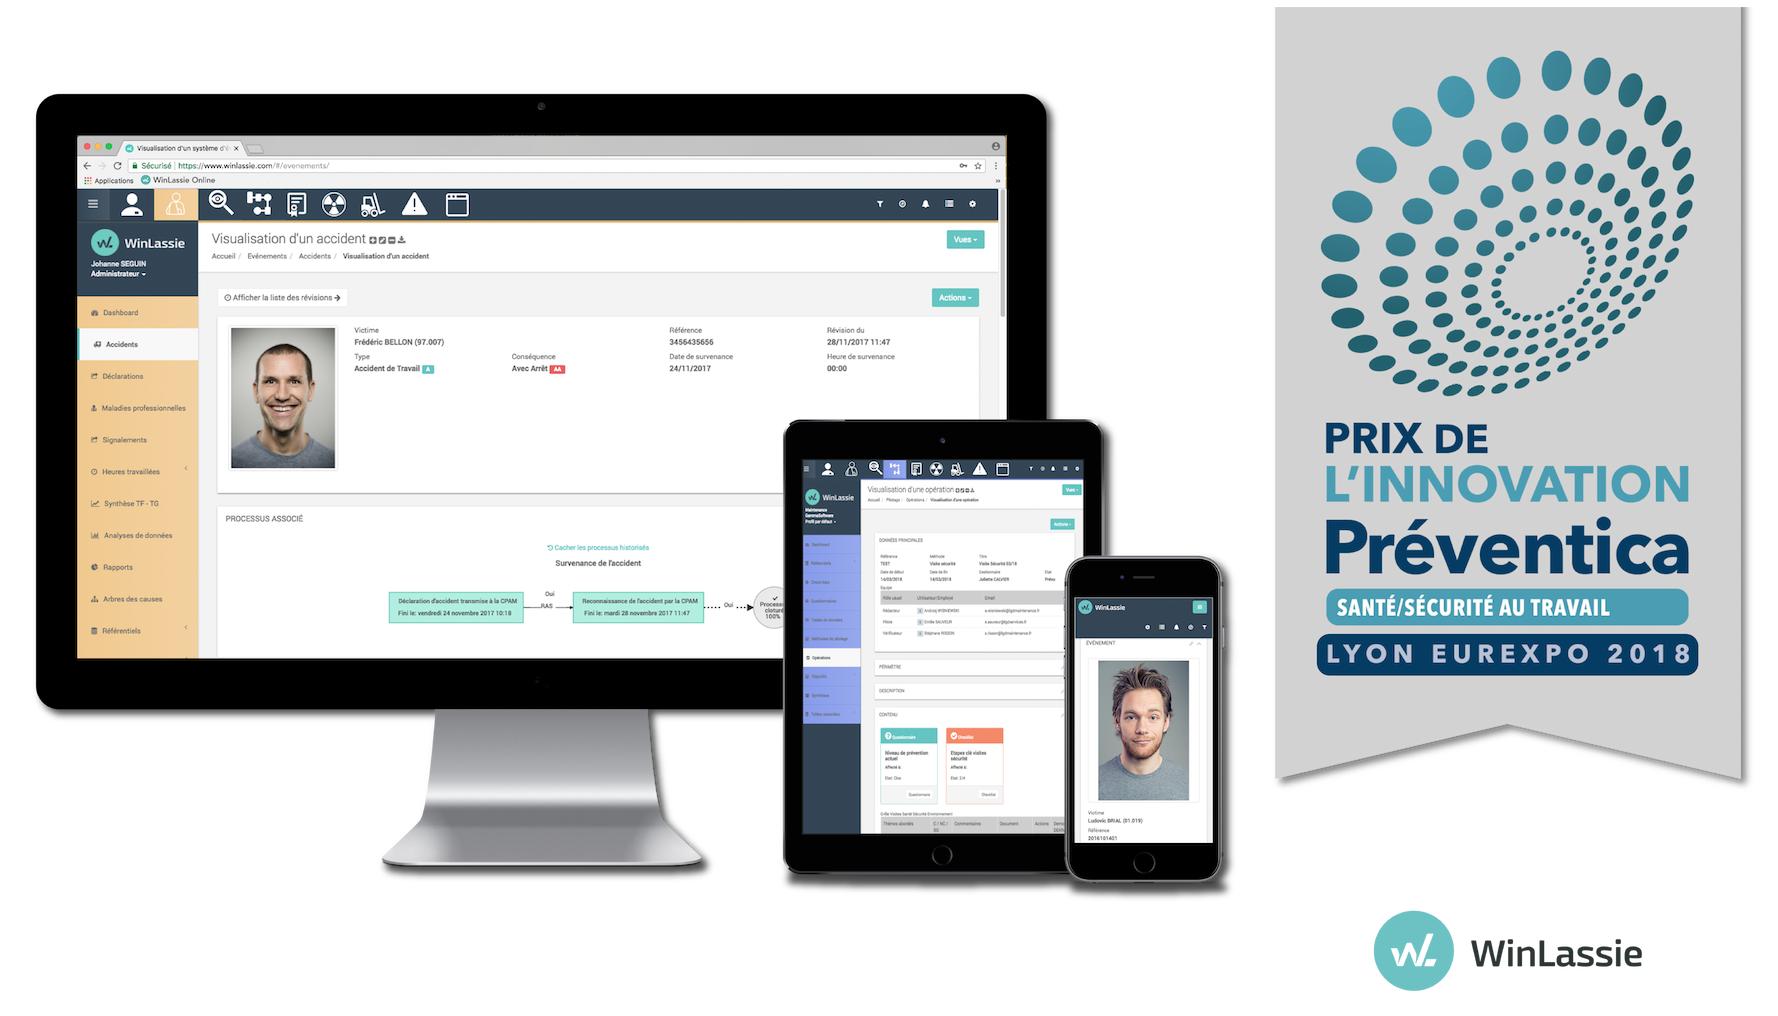 winlassie-online-prix-de-linnovation-preventica-2018